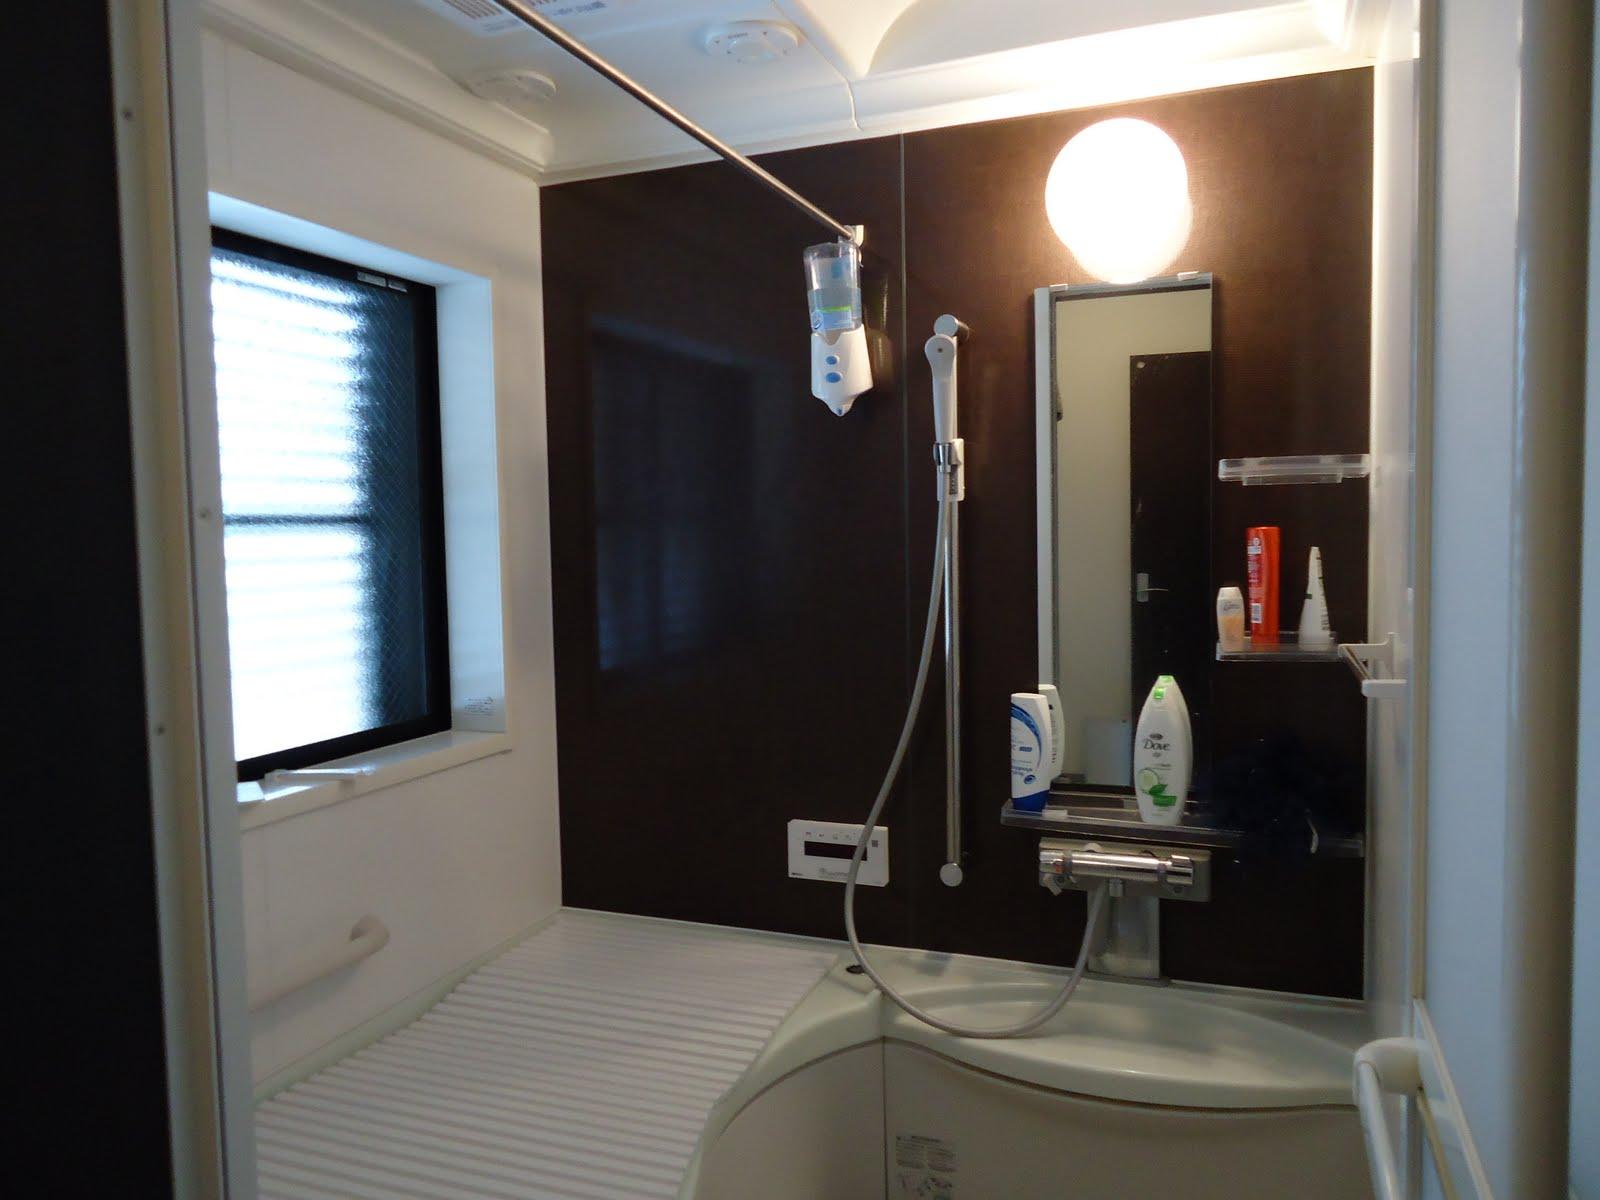 Best bathrooms ever interior design company for Best bathrooms ever